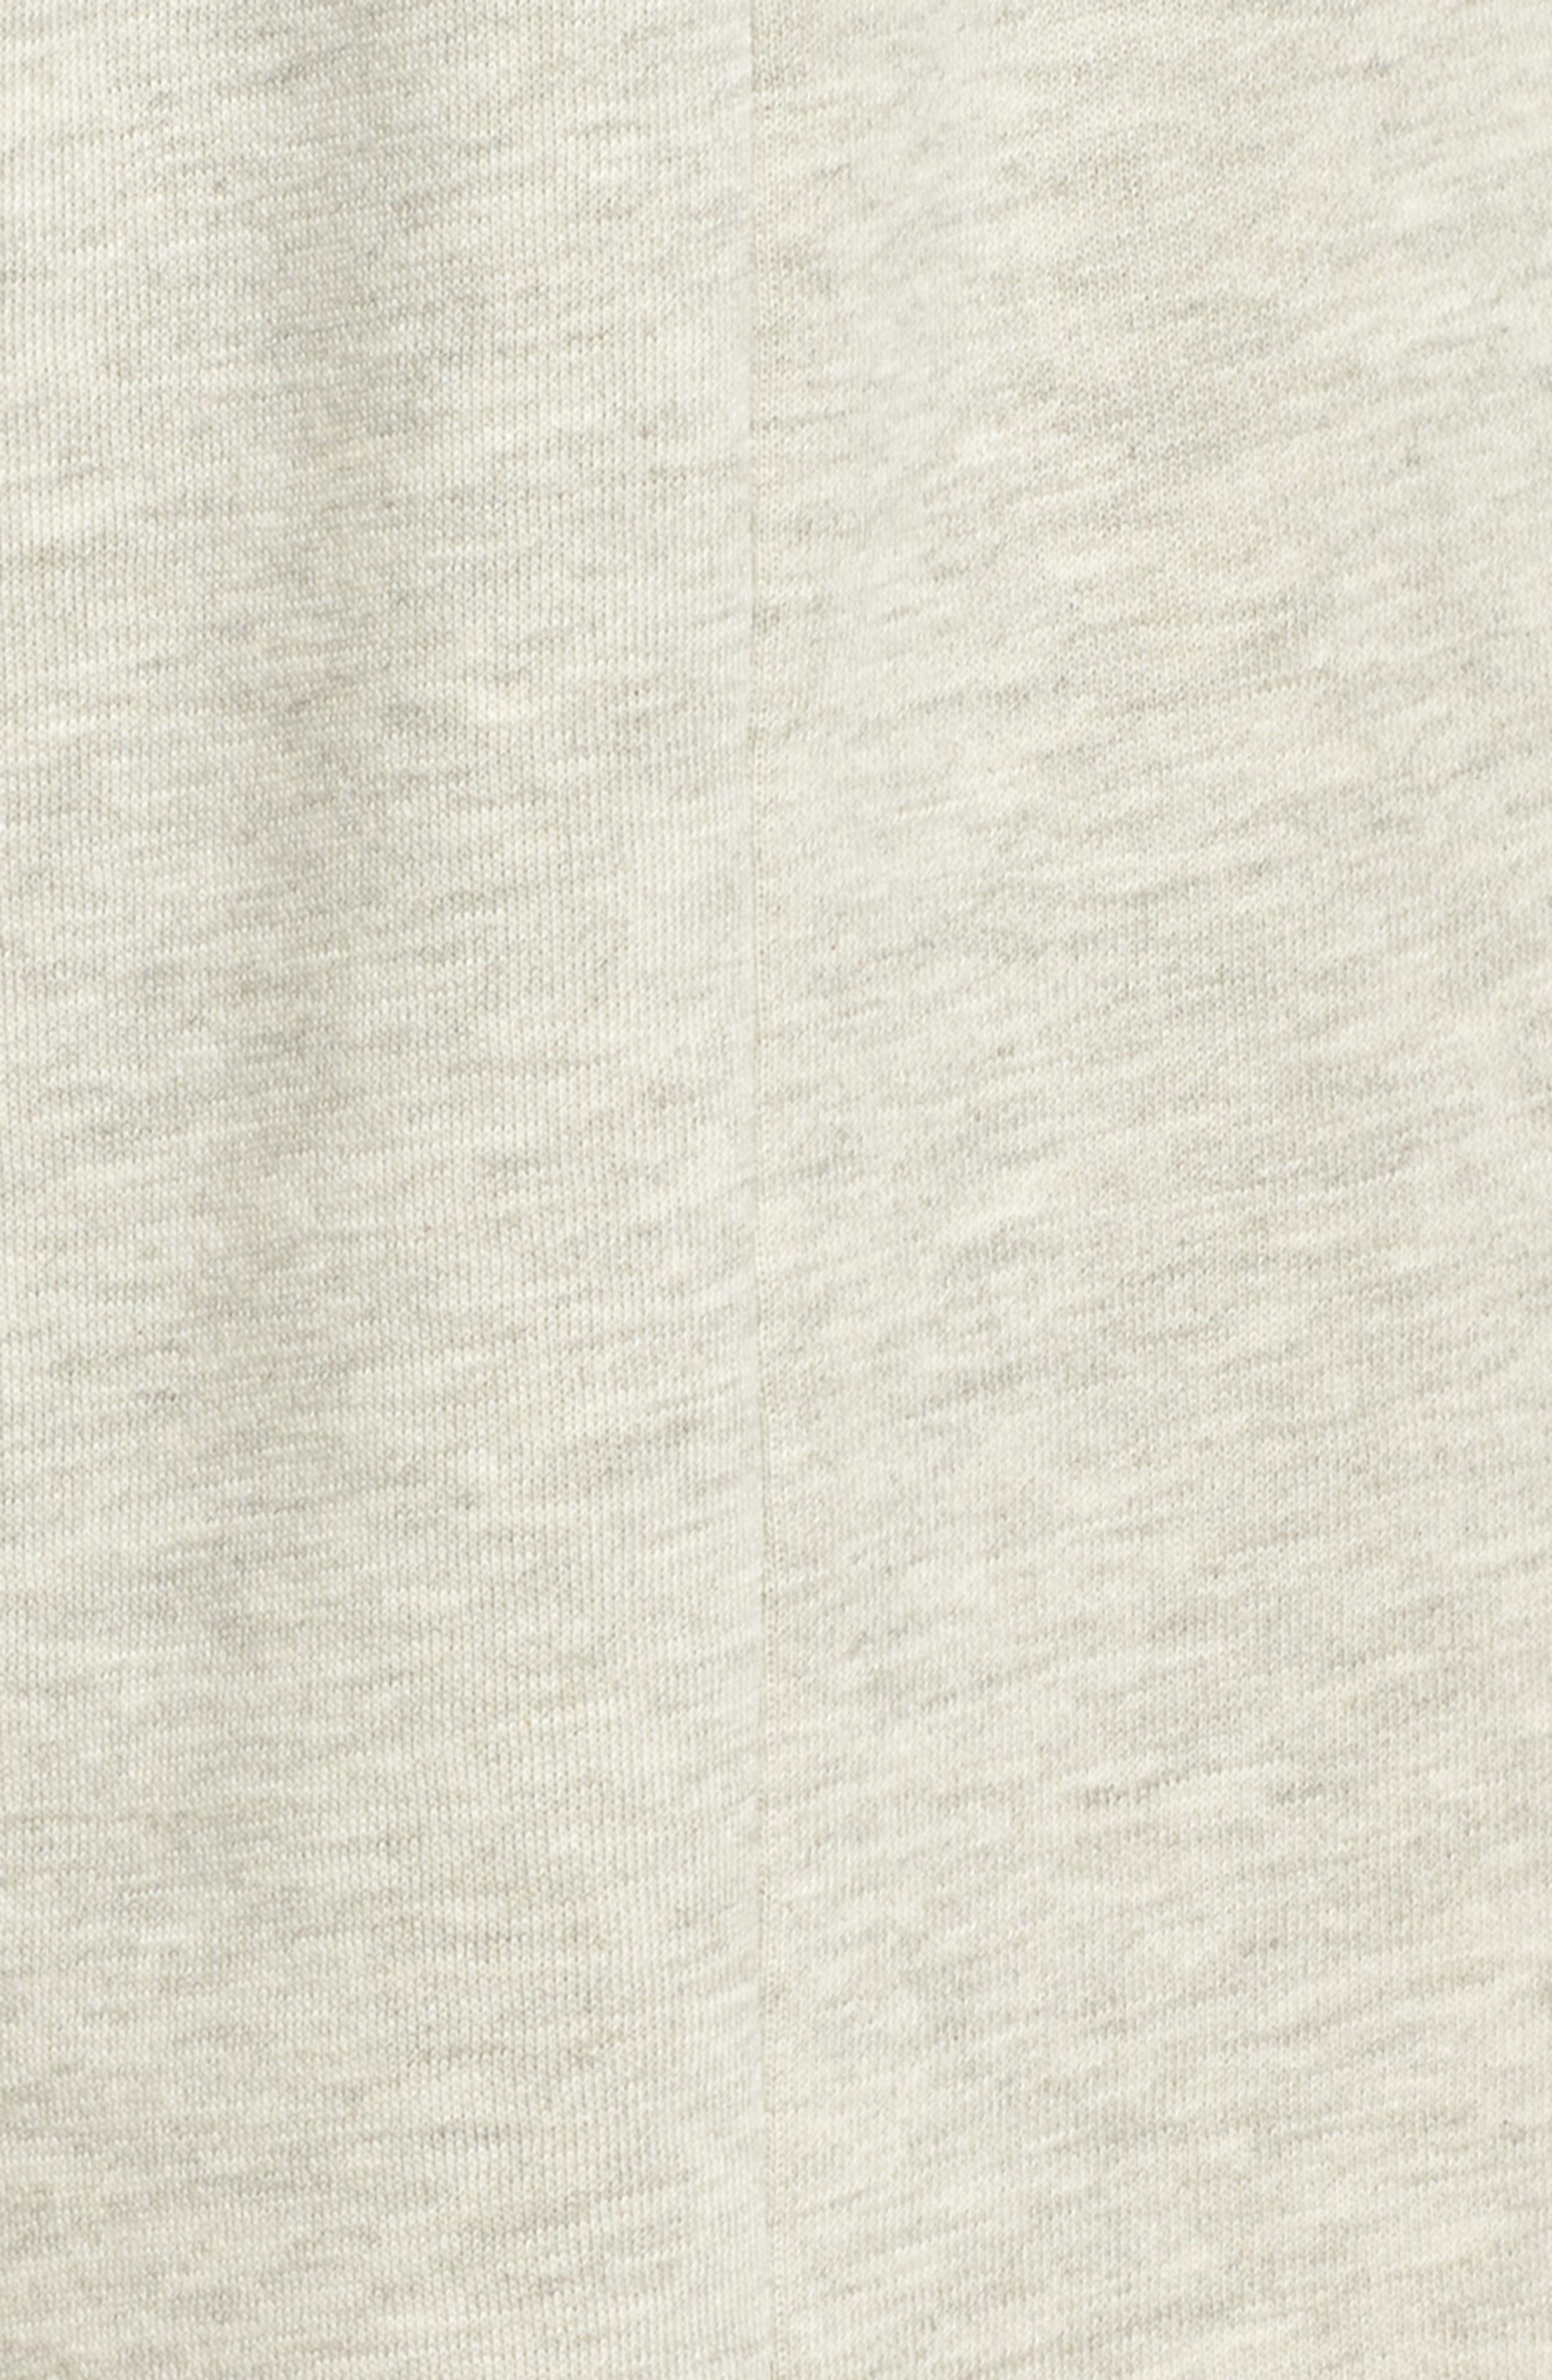 Bermuda Lounge Shorts,                             Alternate thumbnail 5, color,                             PEBBLE HEATHER